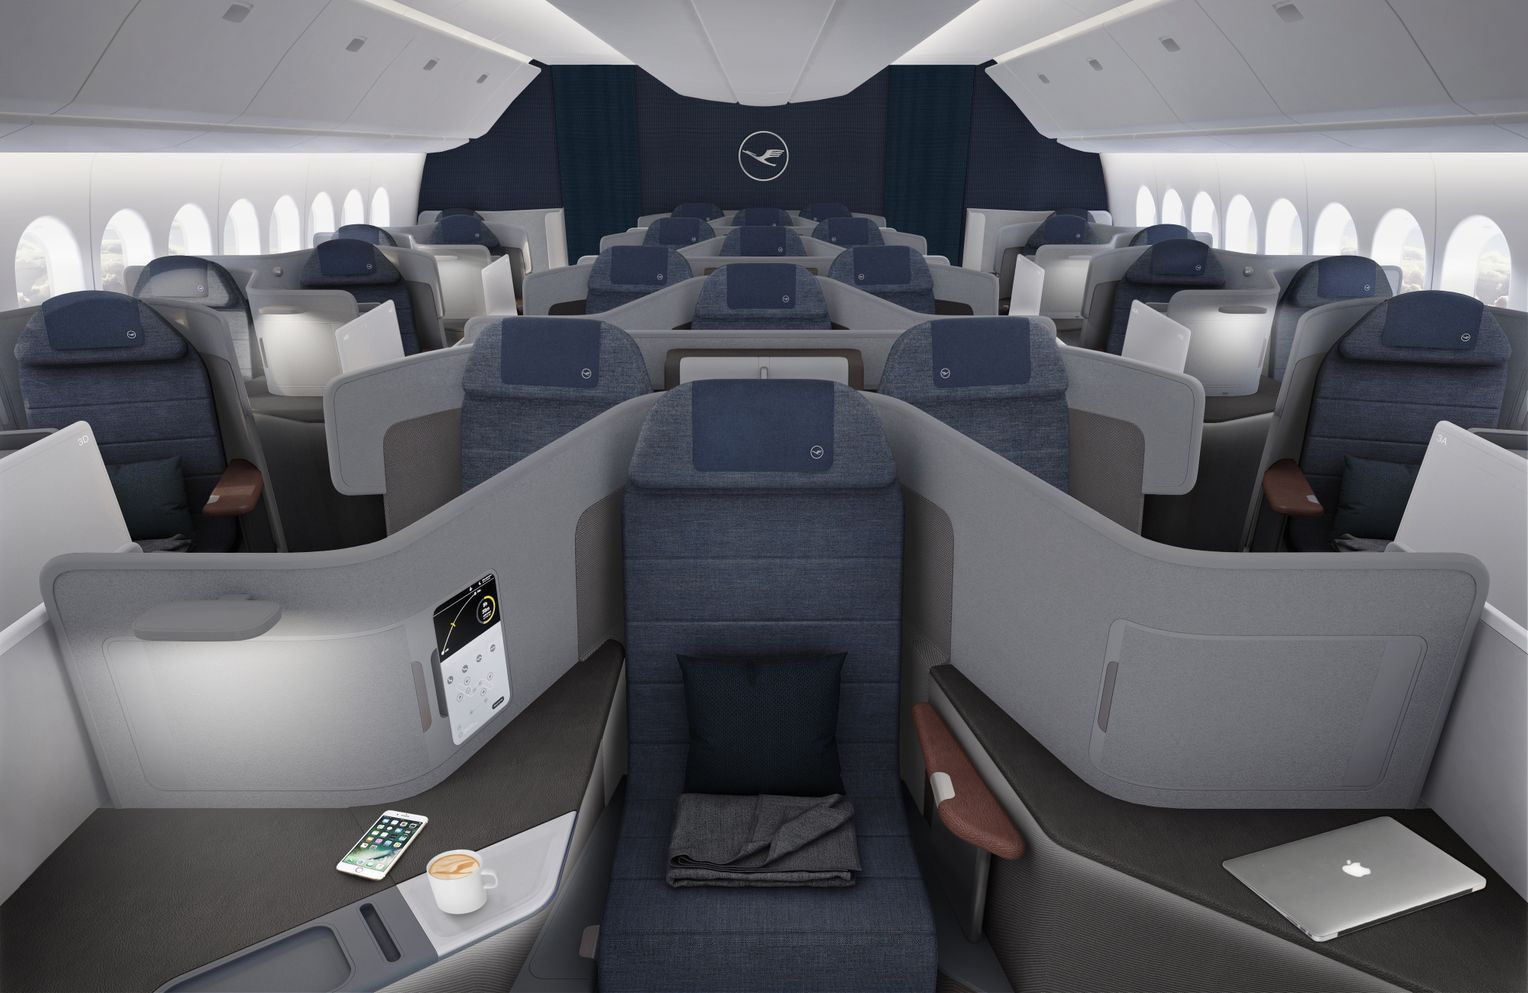 800 boeing tuifly sitzabstand 737 Tuifly X3